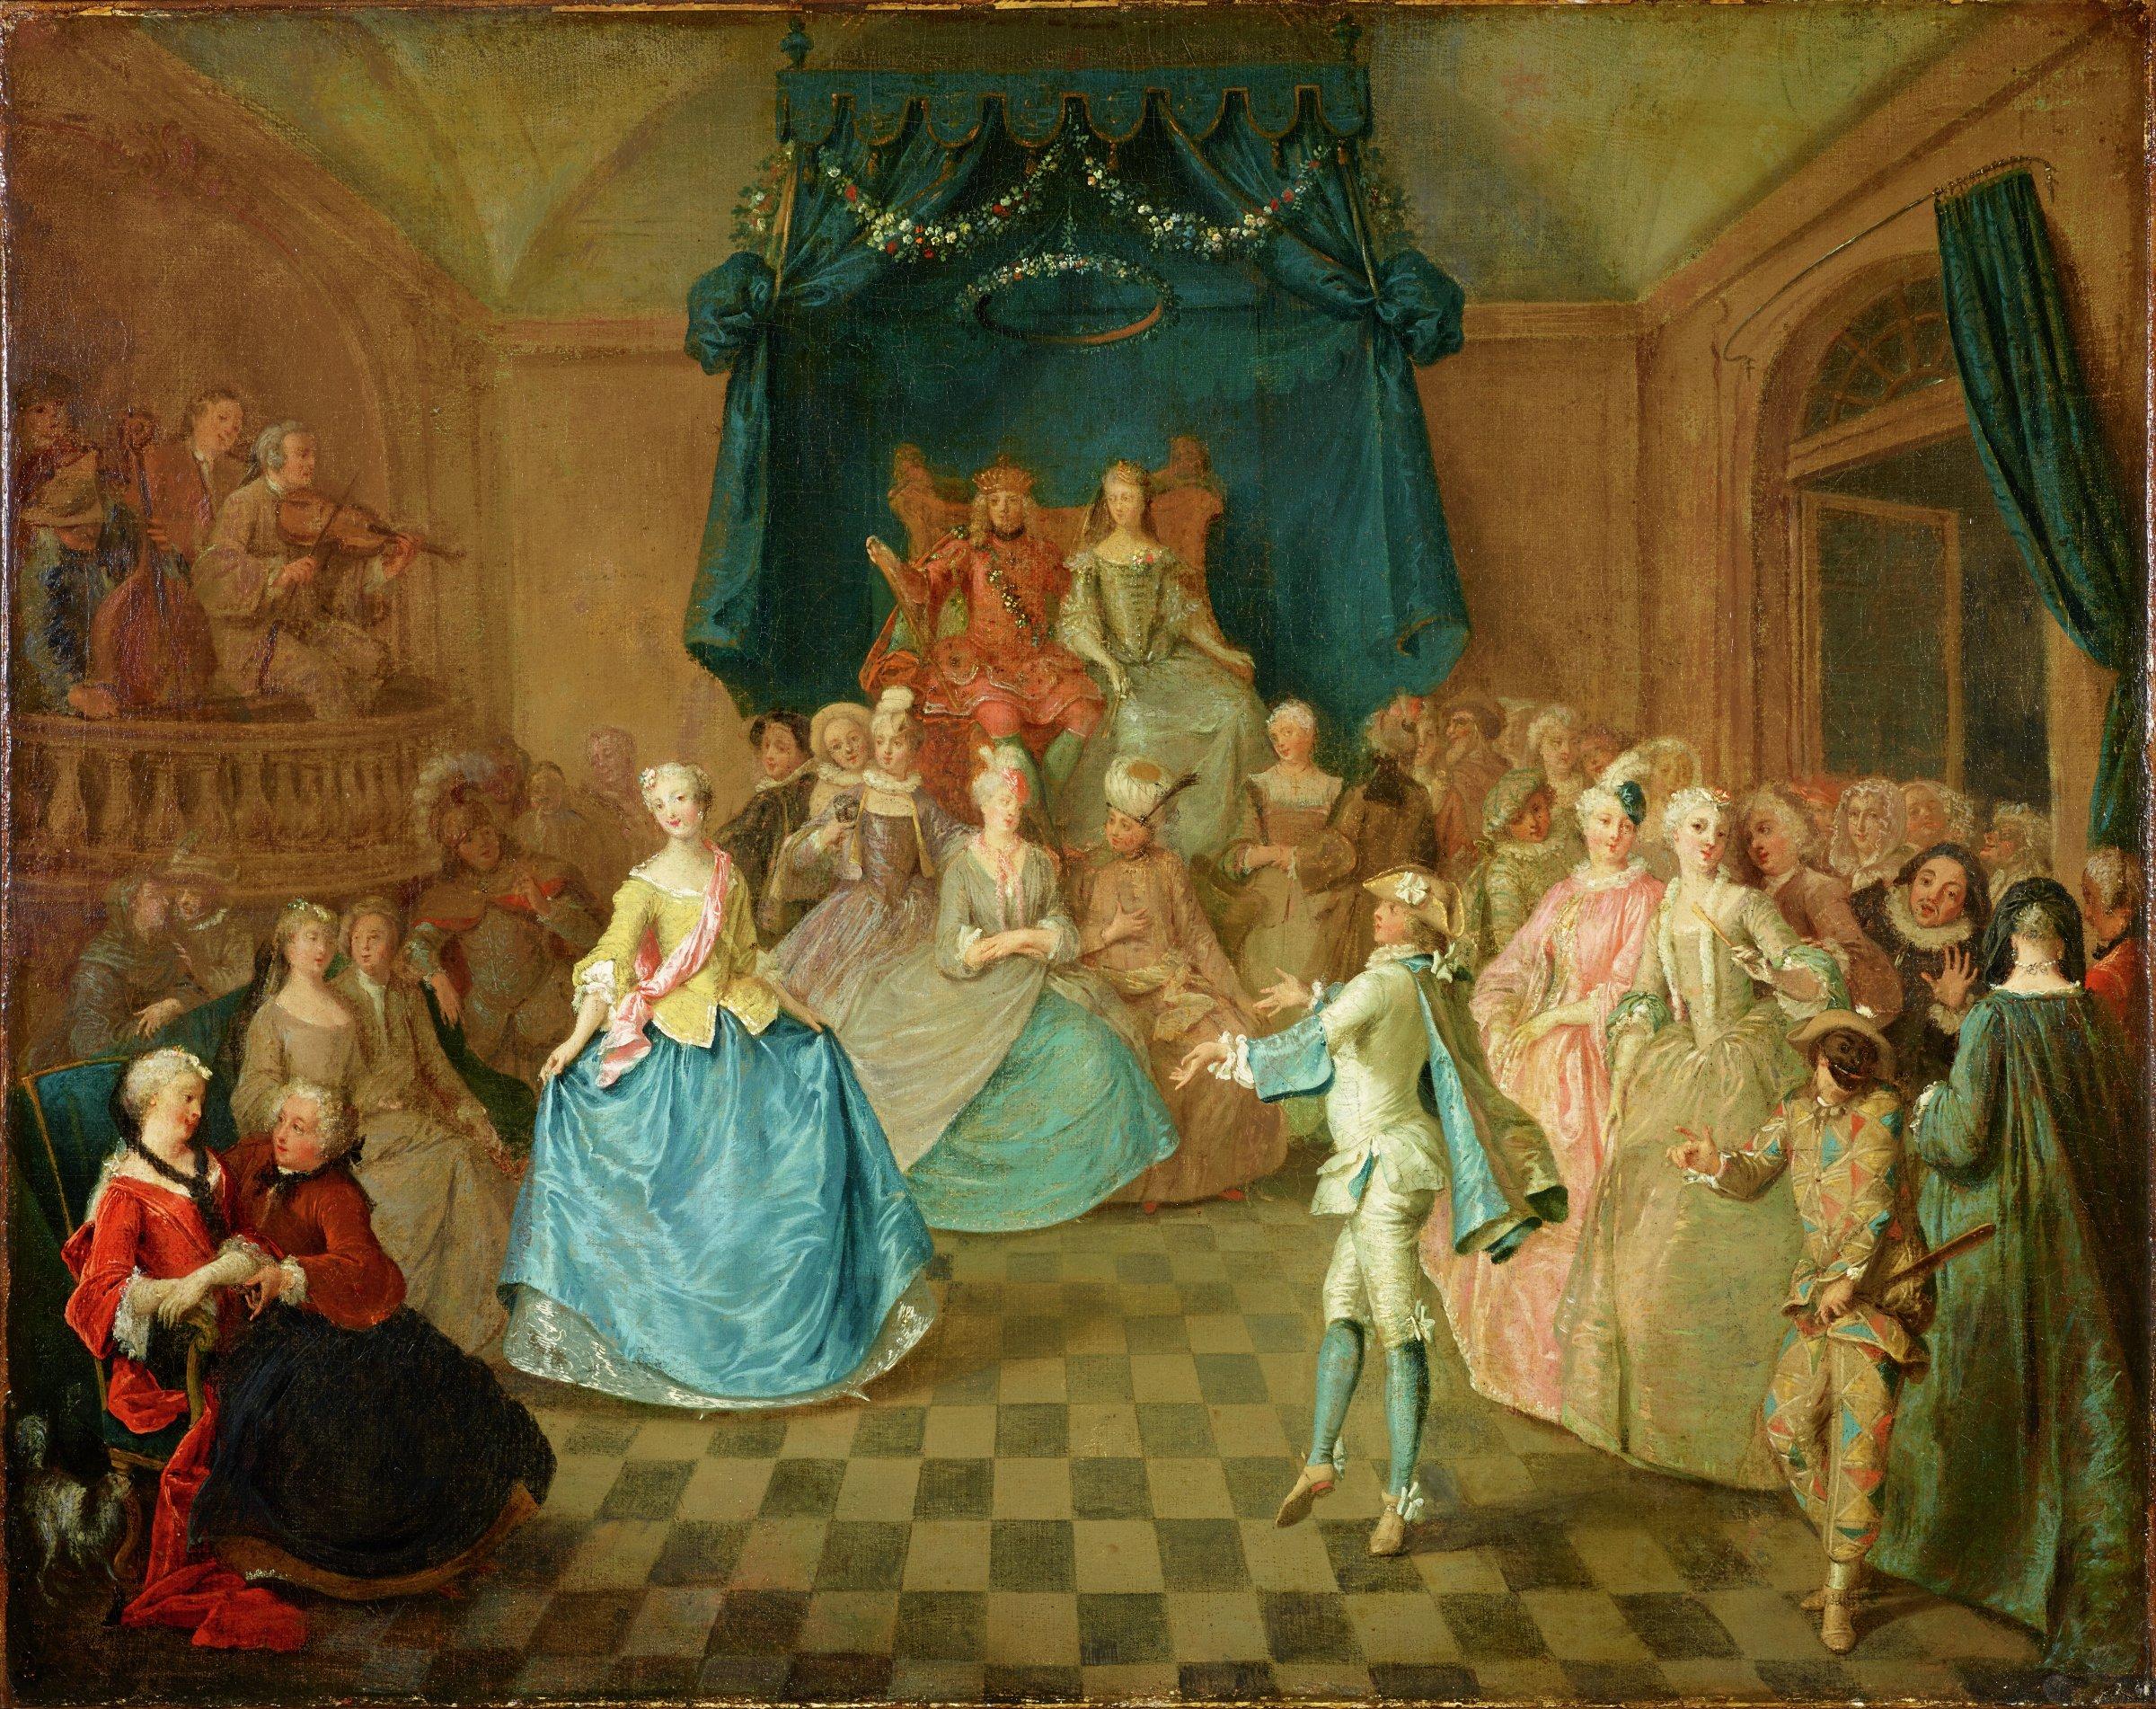 Court Dance, Follower of Gravelot, possibly Christian Wilhelm Ernst Dietrich, oil on canvas